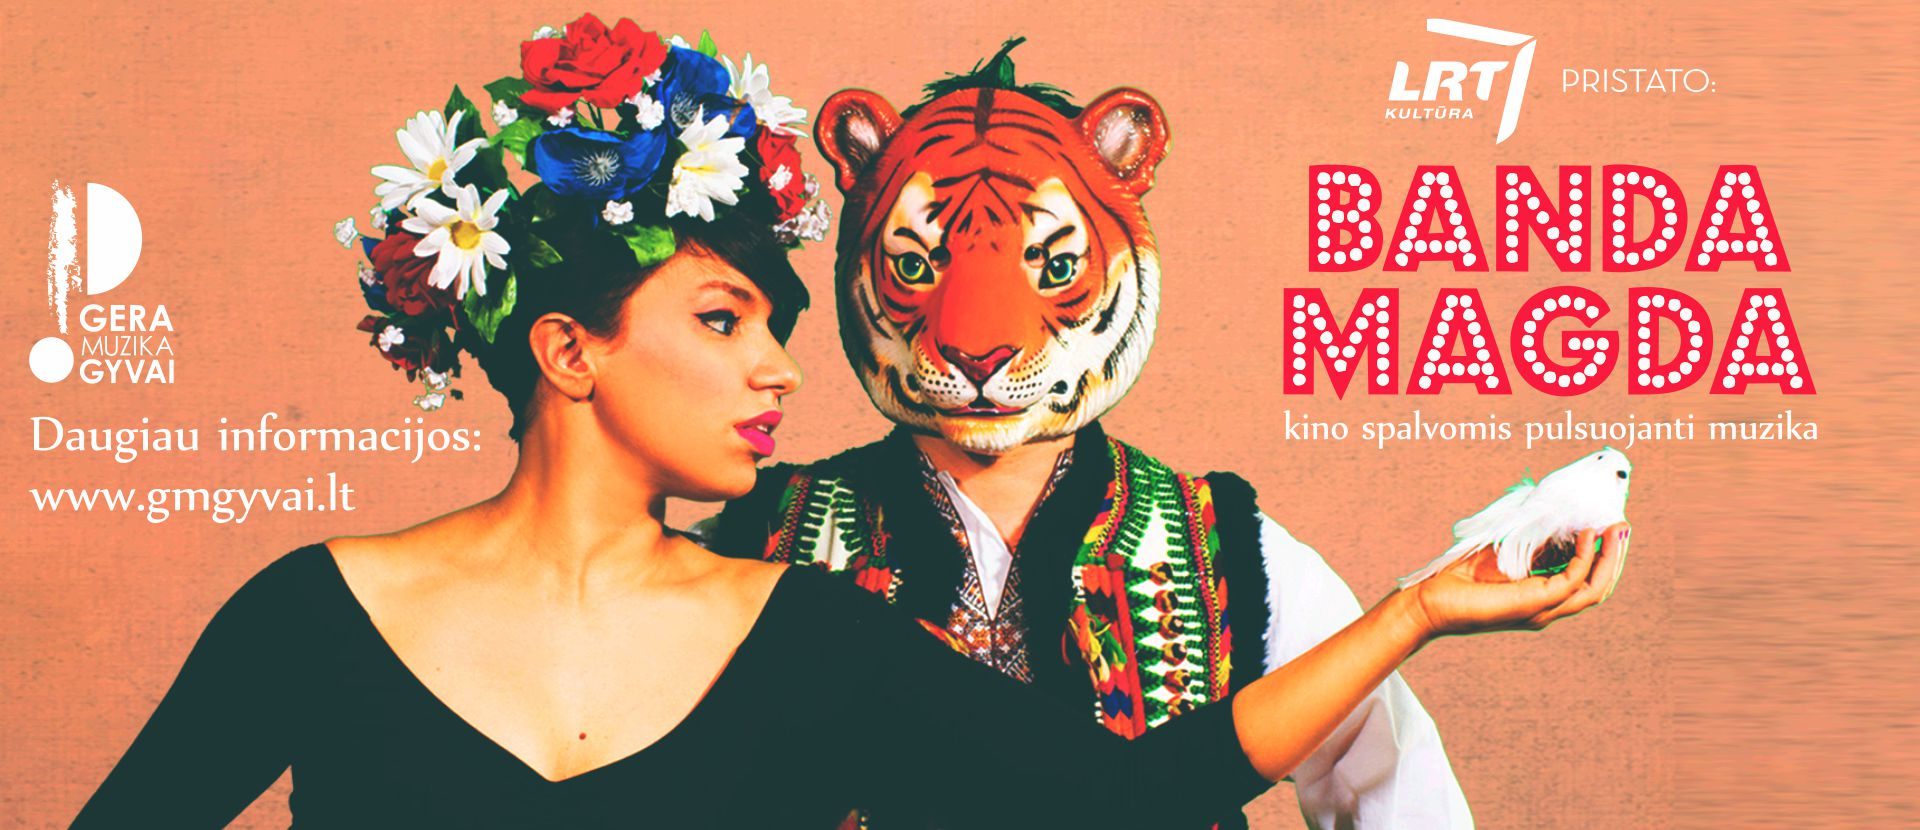 Banda Magda - kino spalvomis alsuojanti muzika